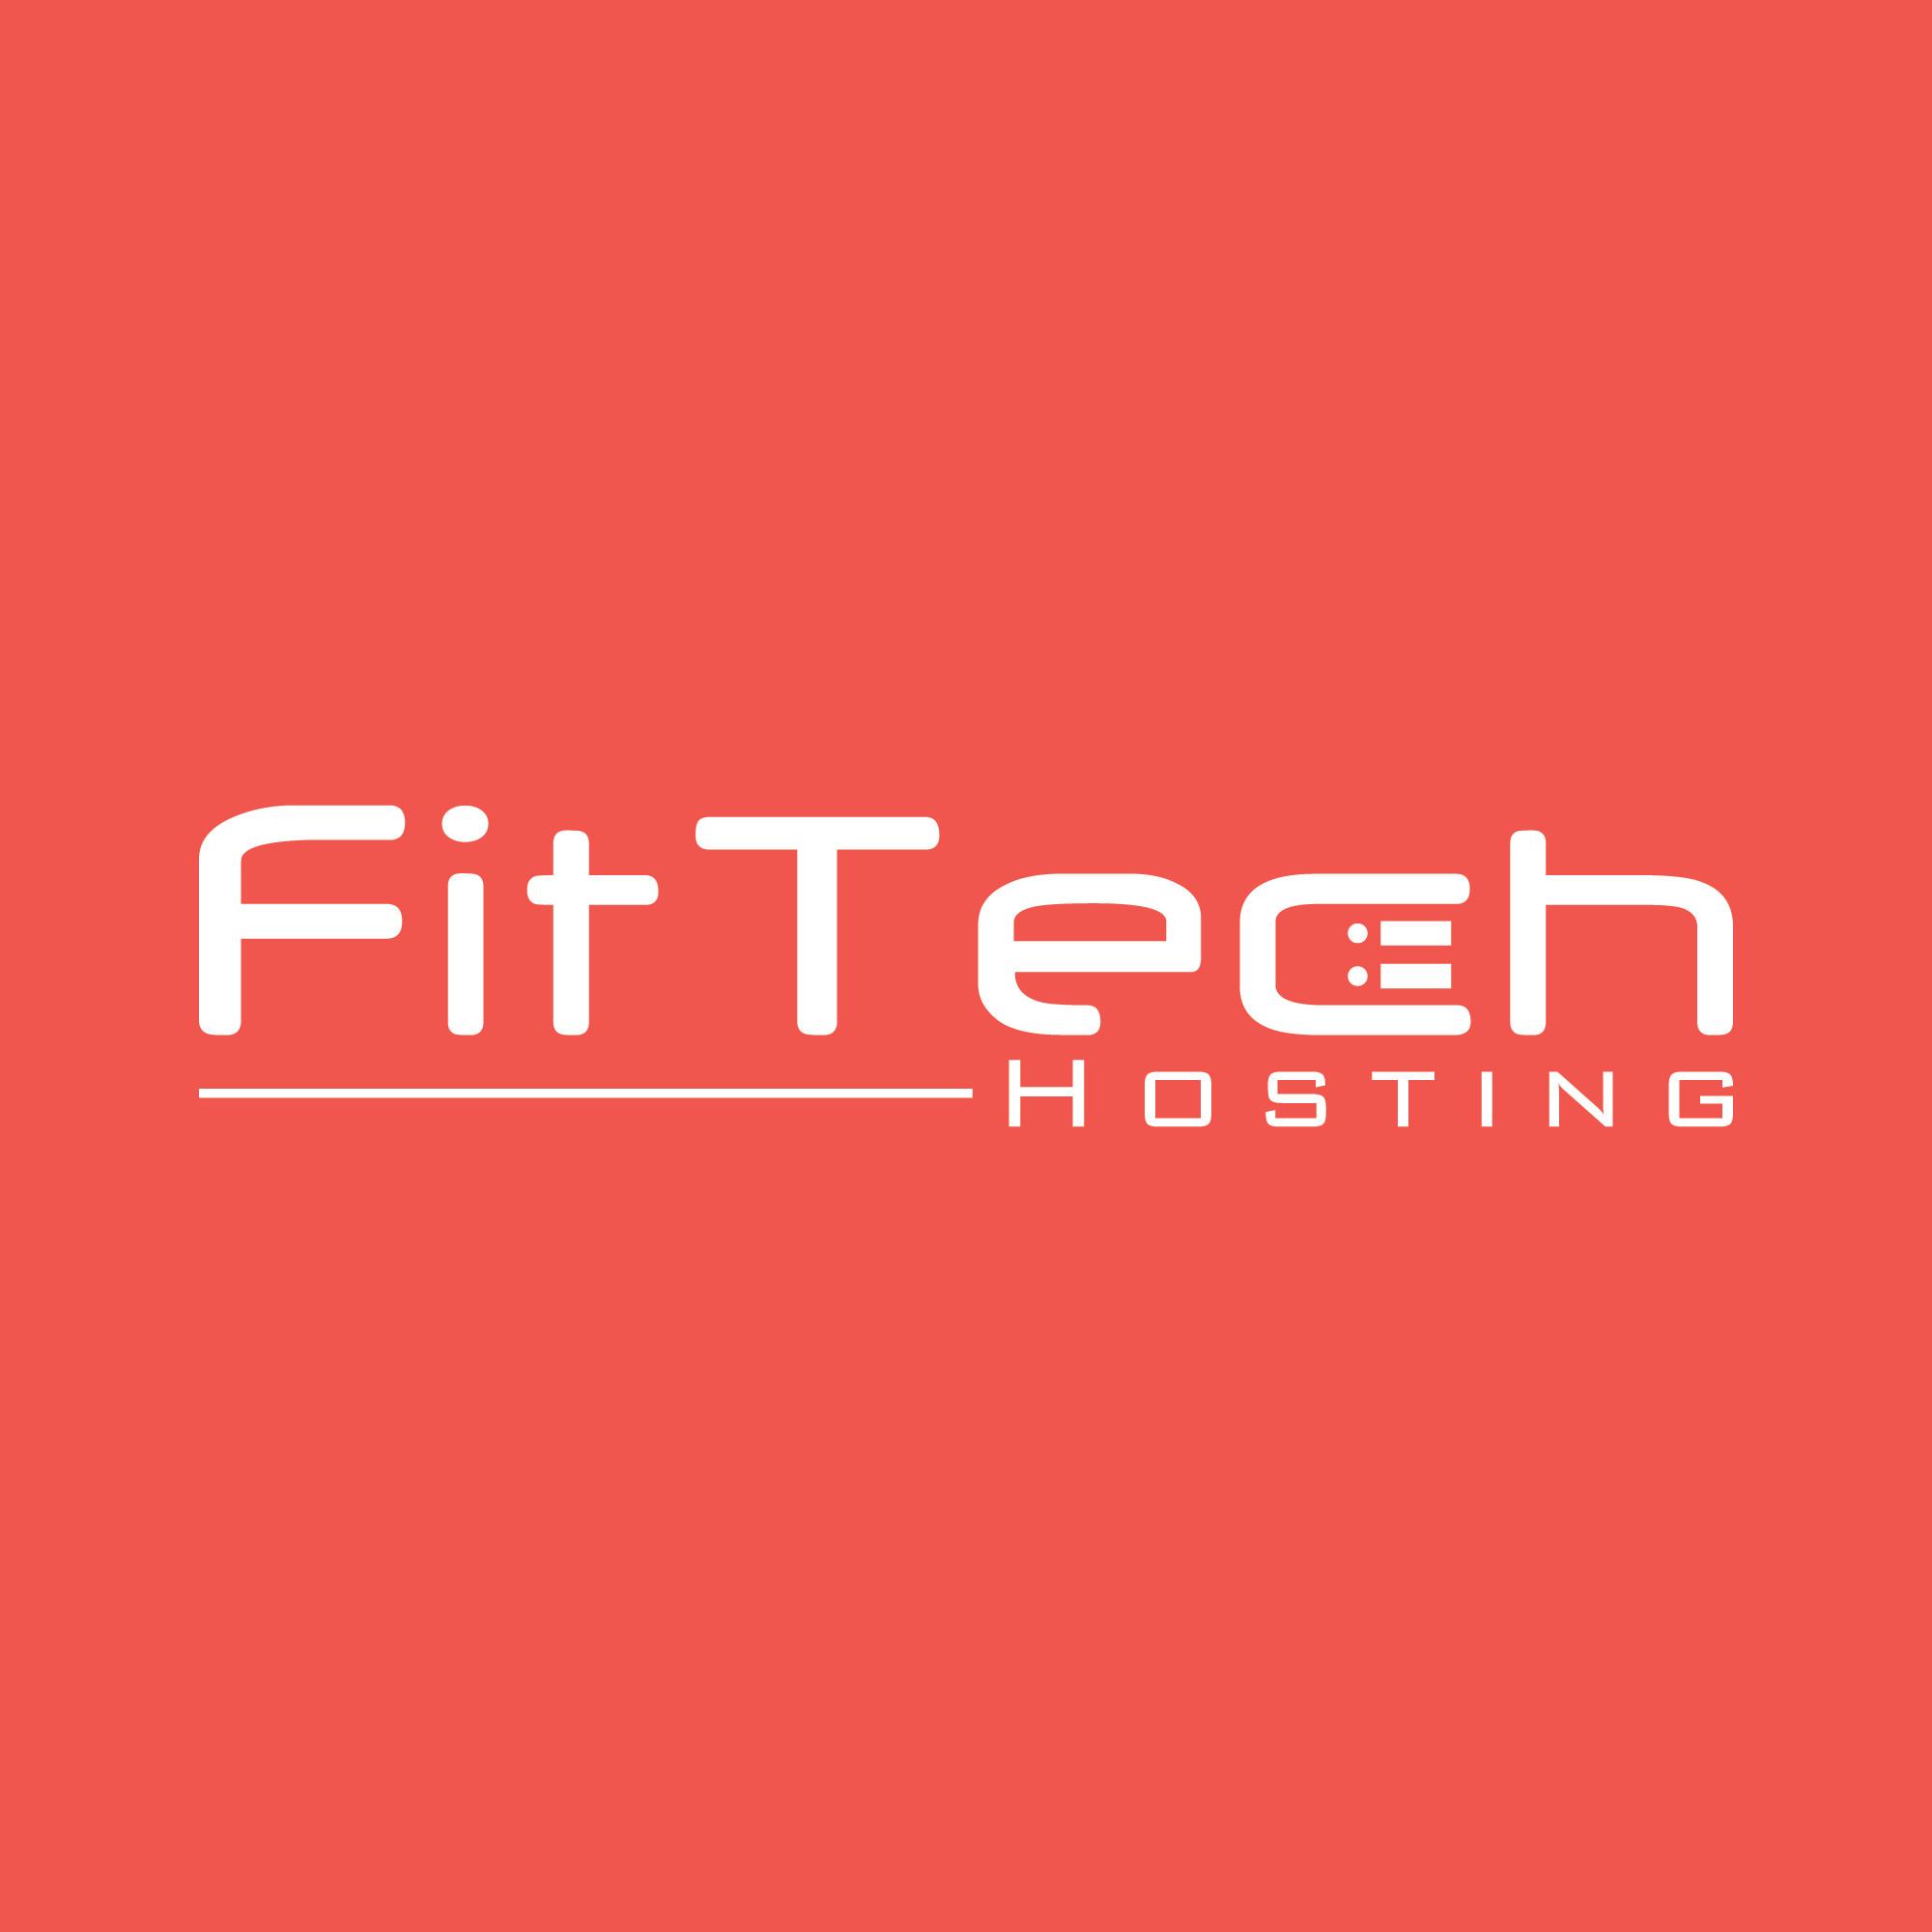 FitTech Hosting